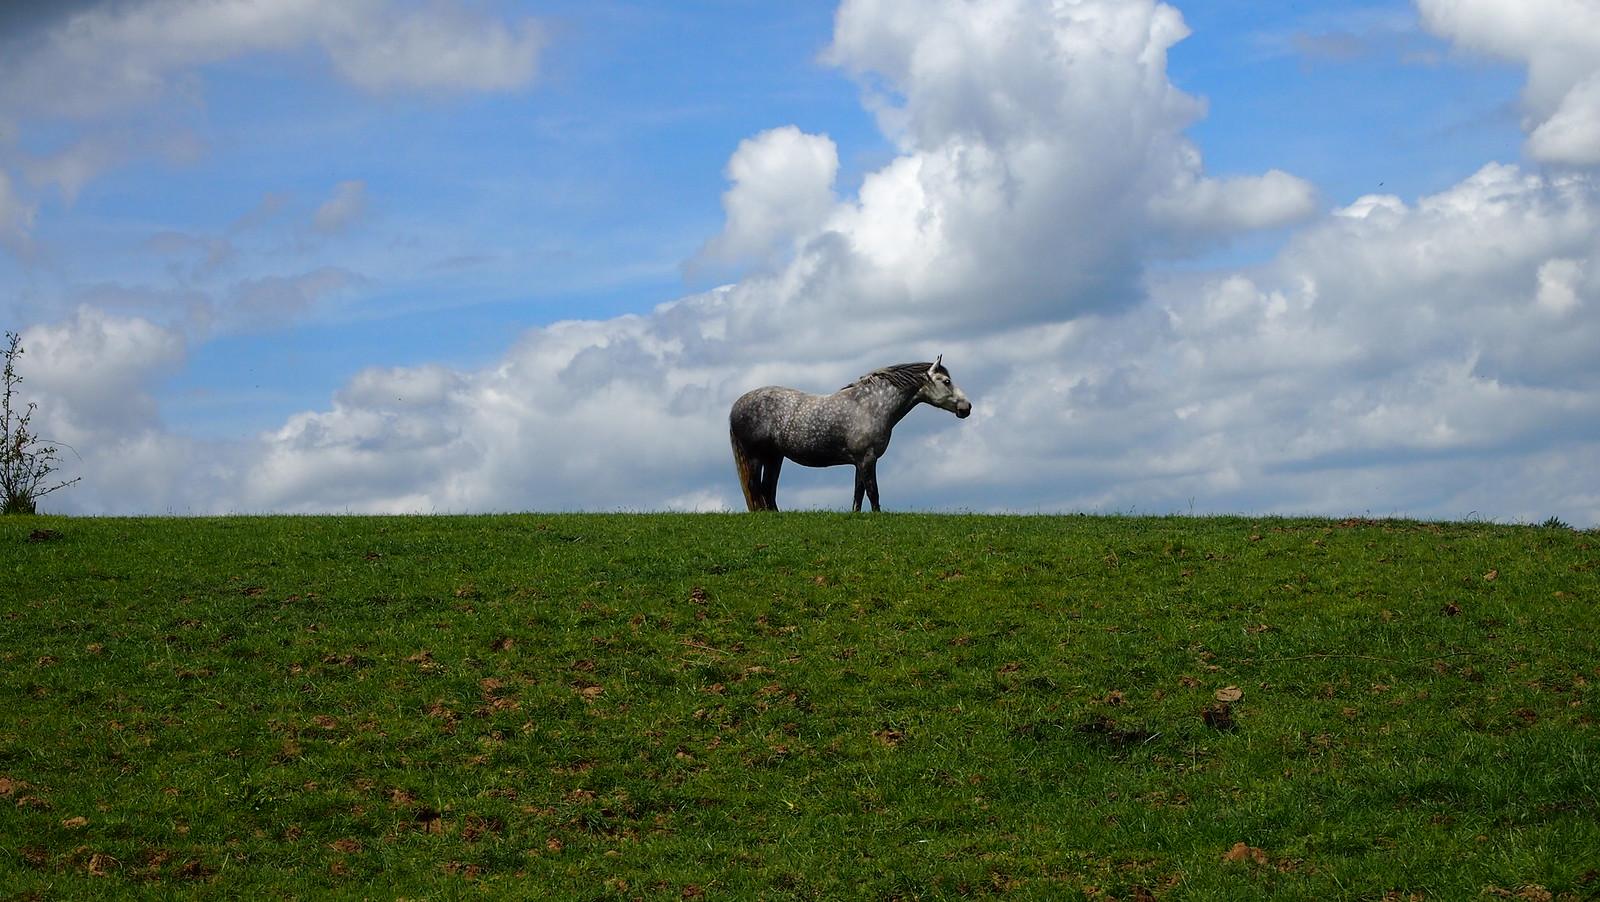 Horse OLYMPUS DIGITAL CAMERA